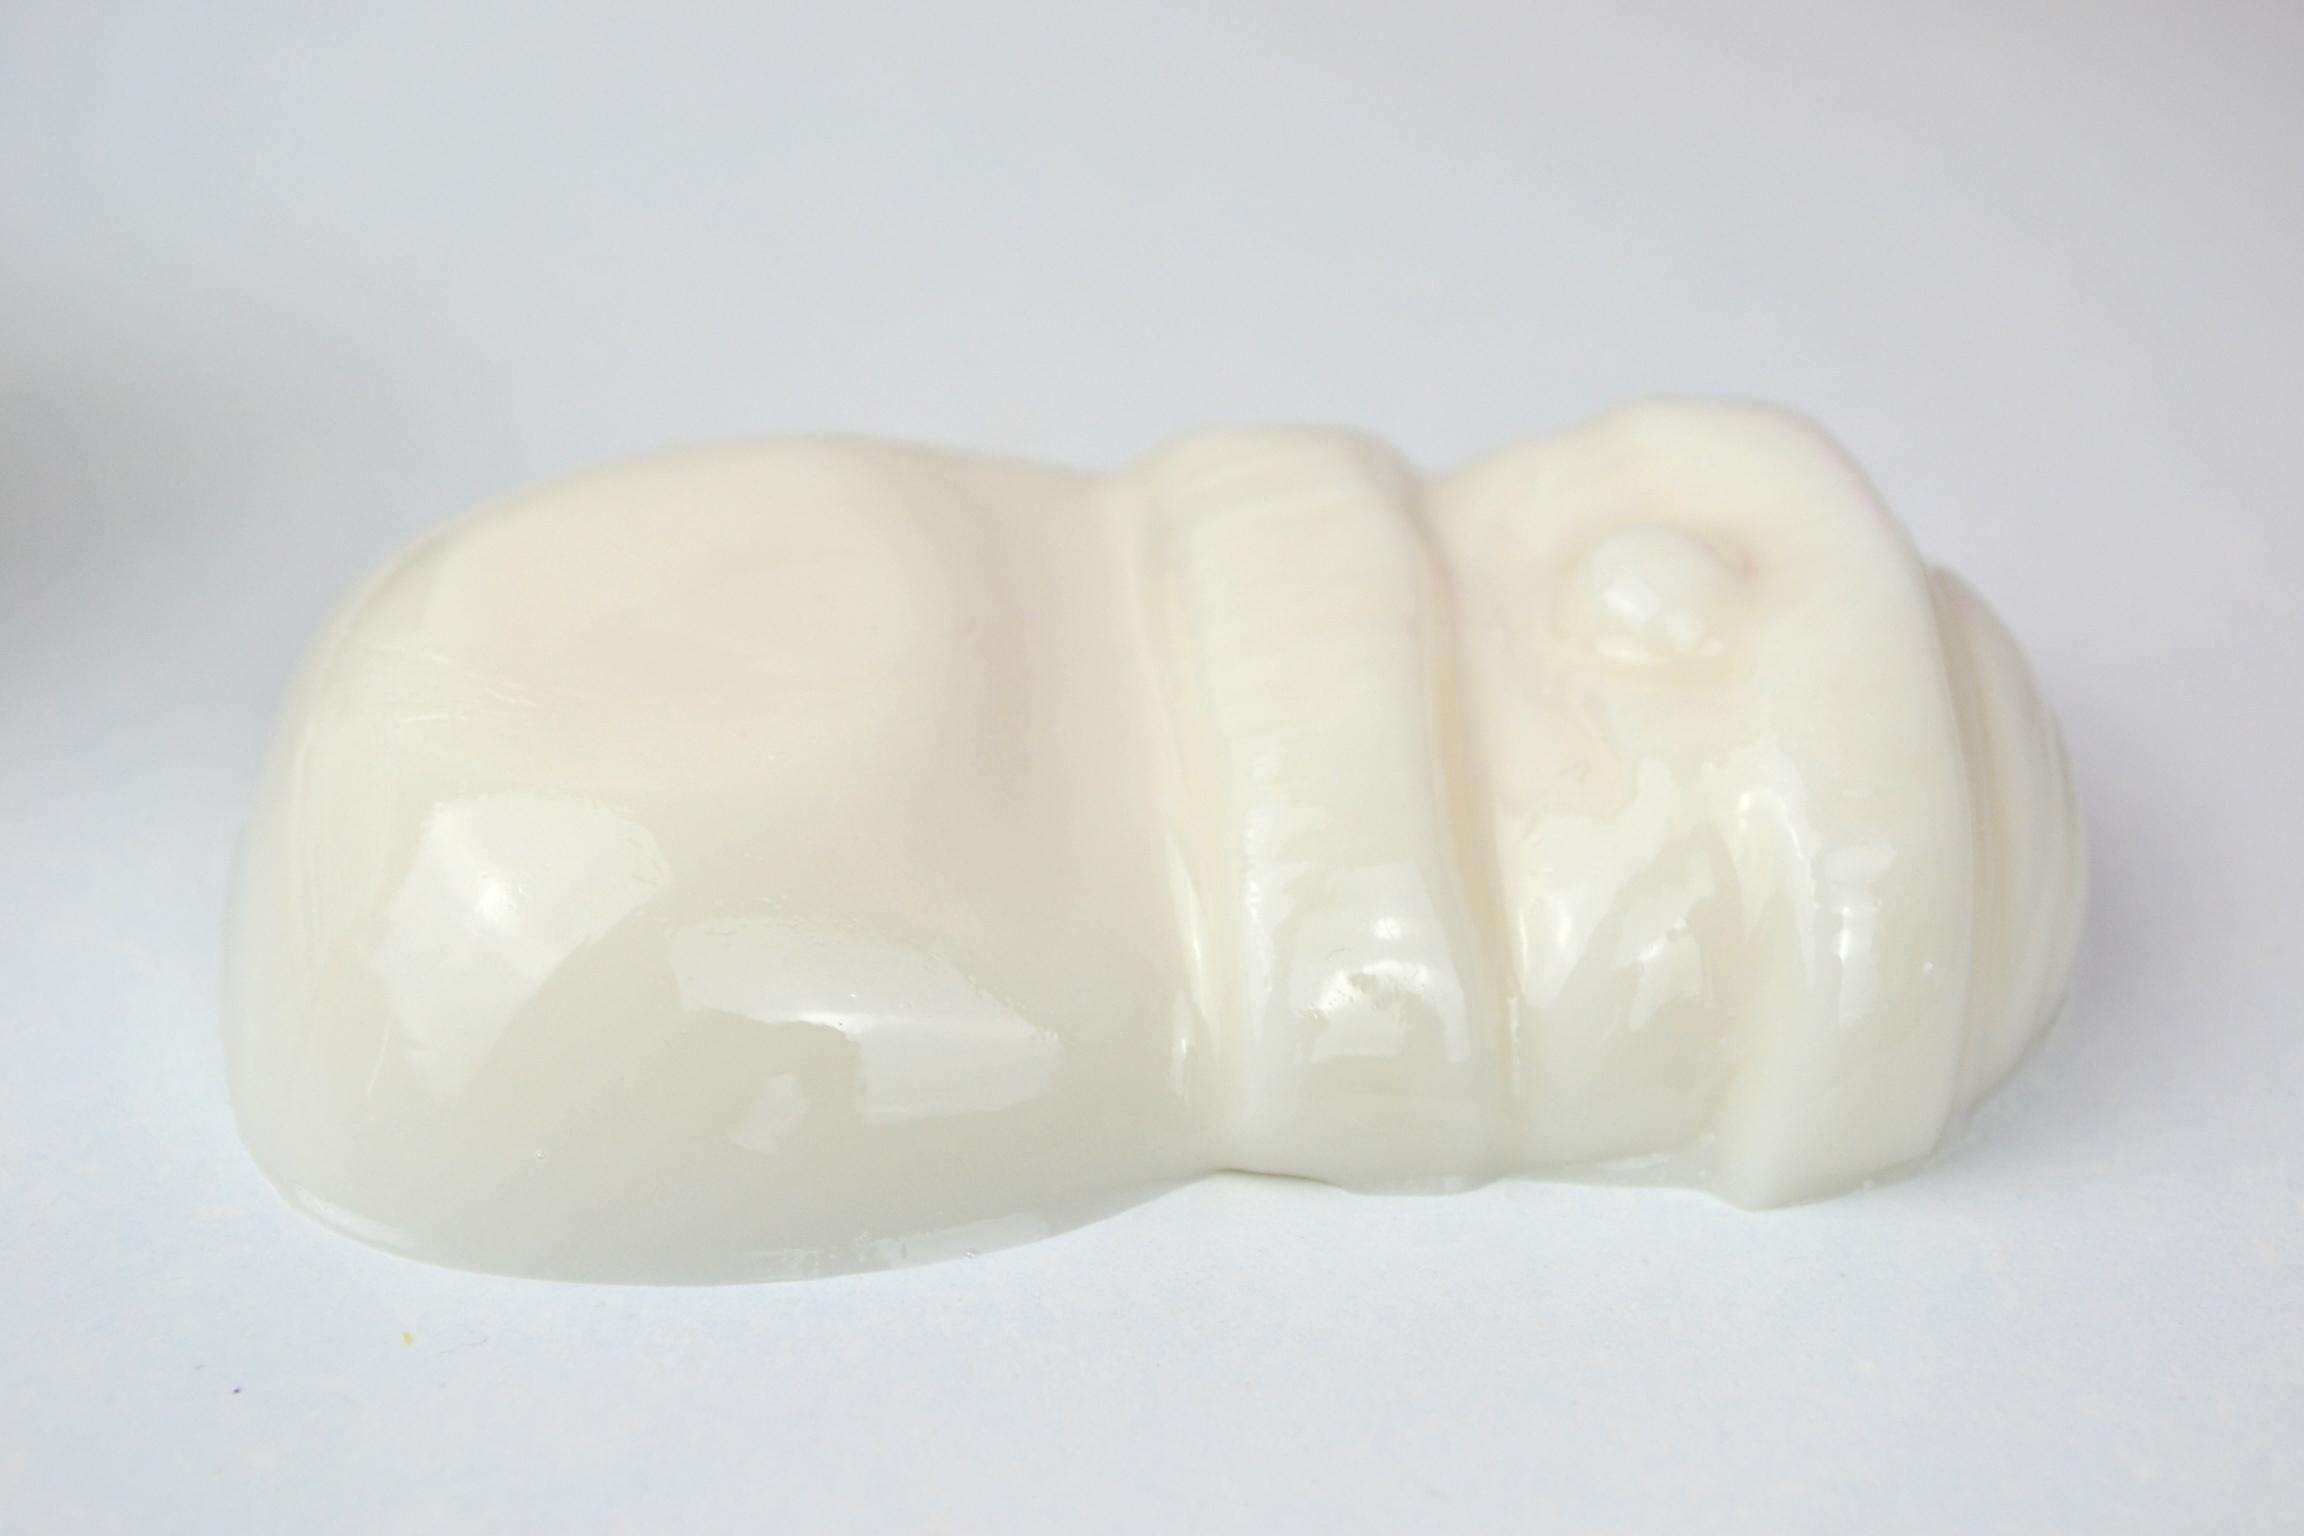 Lush Snowman Shower Jelly